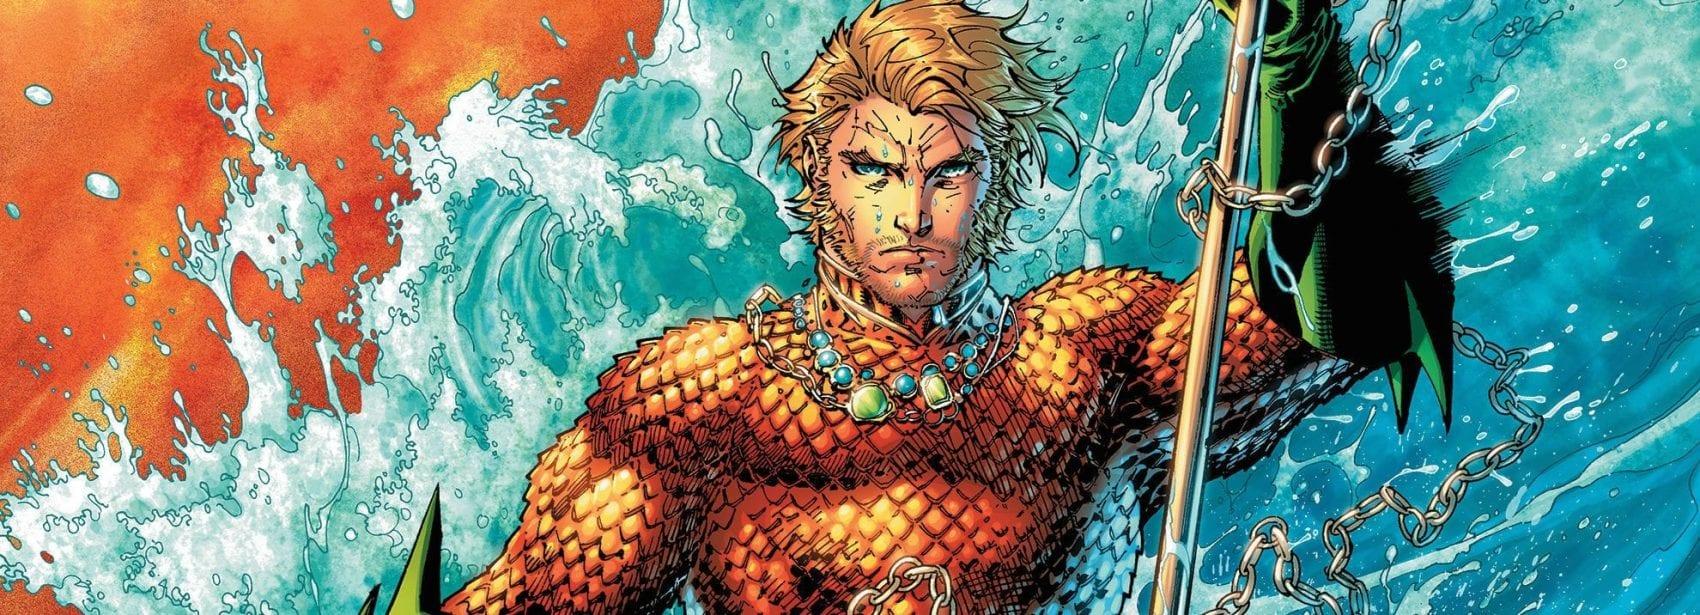 Battle Thor VS Aquaman My Geek Actu Aquaman.jpg